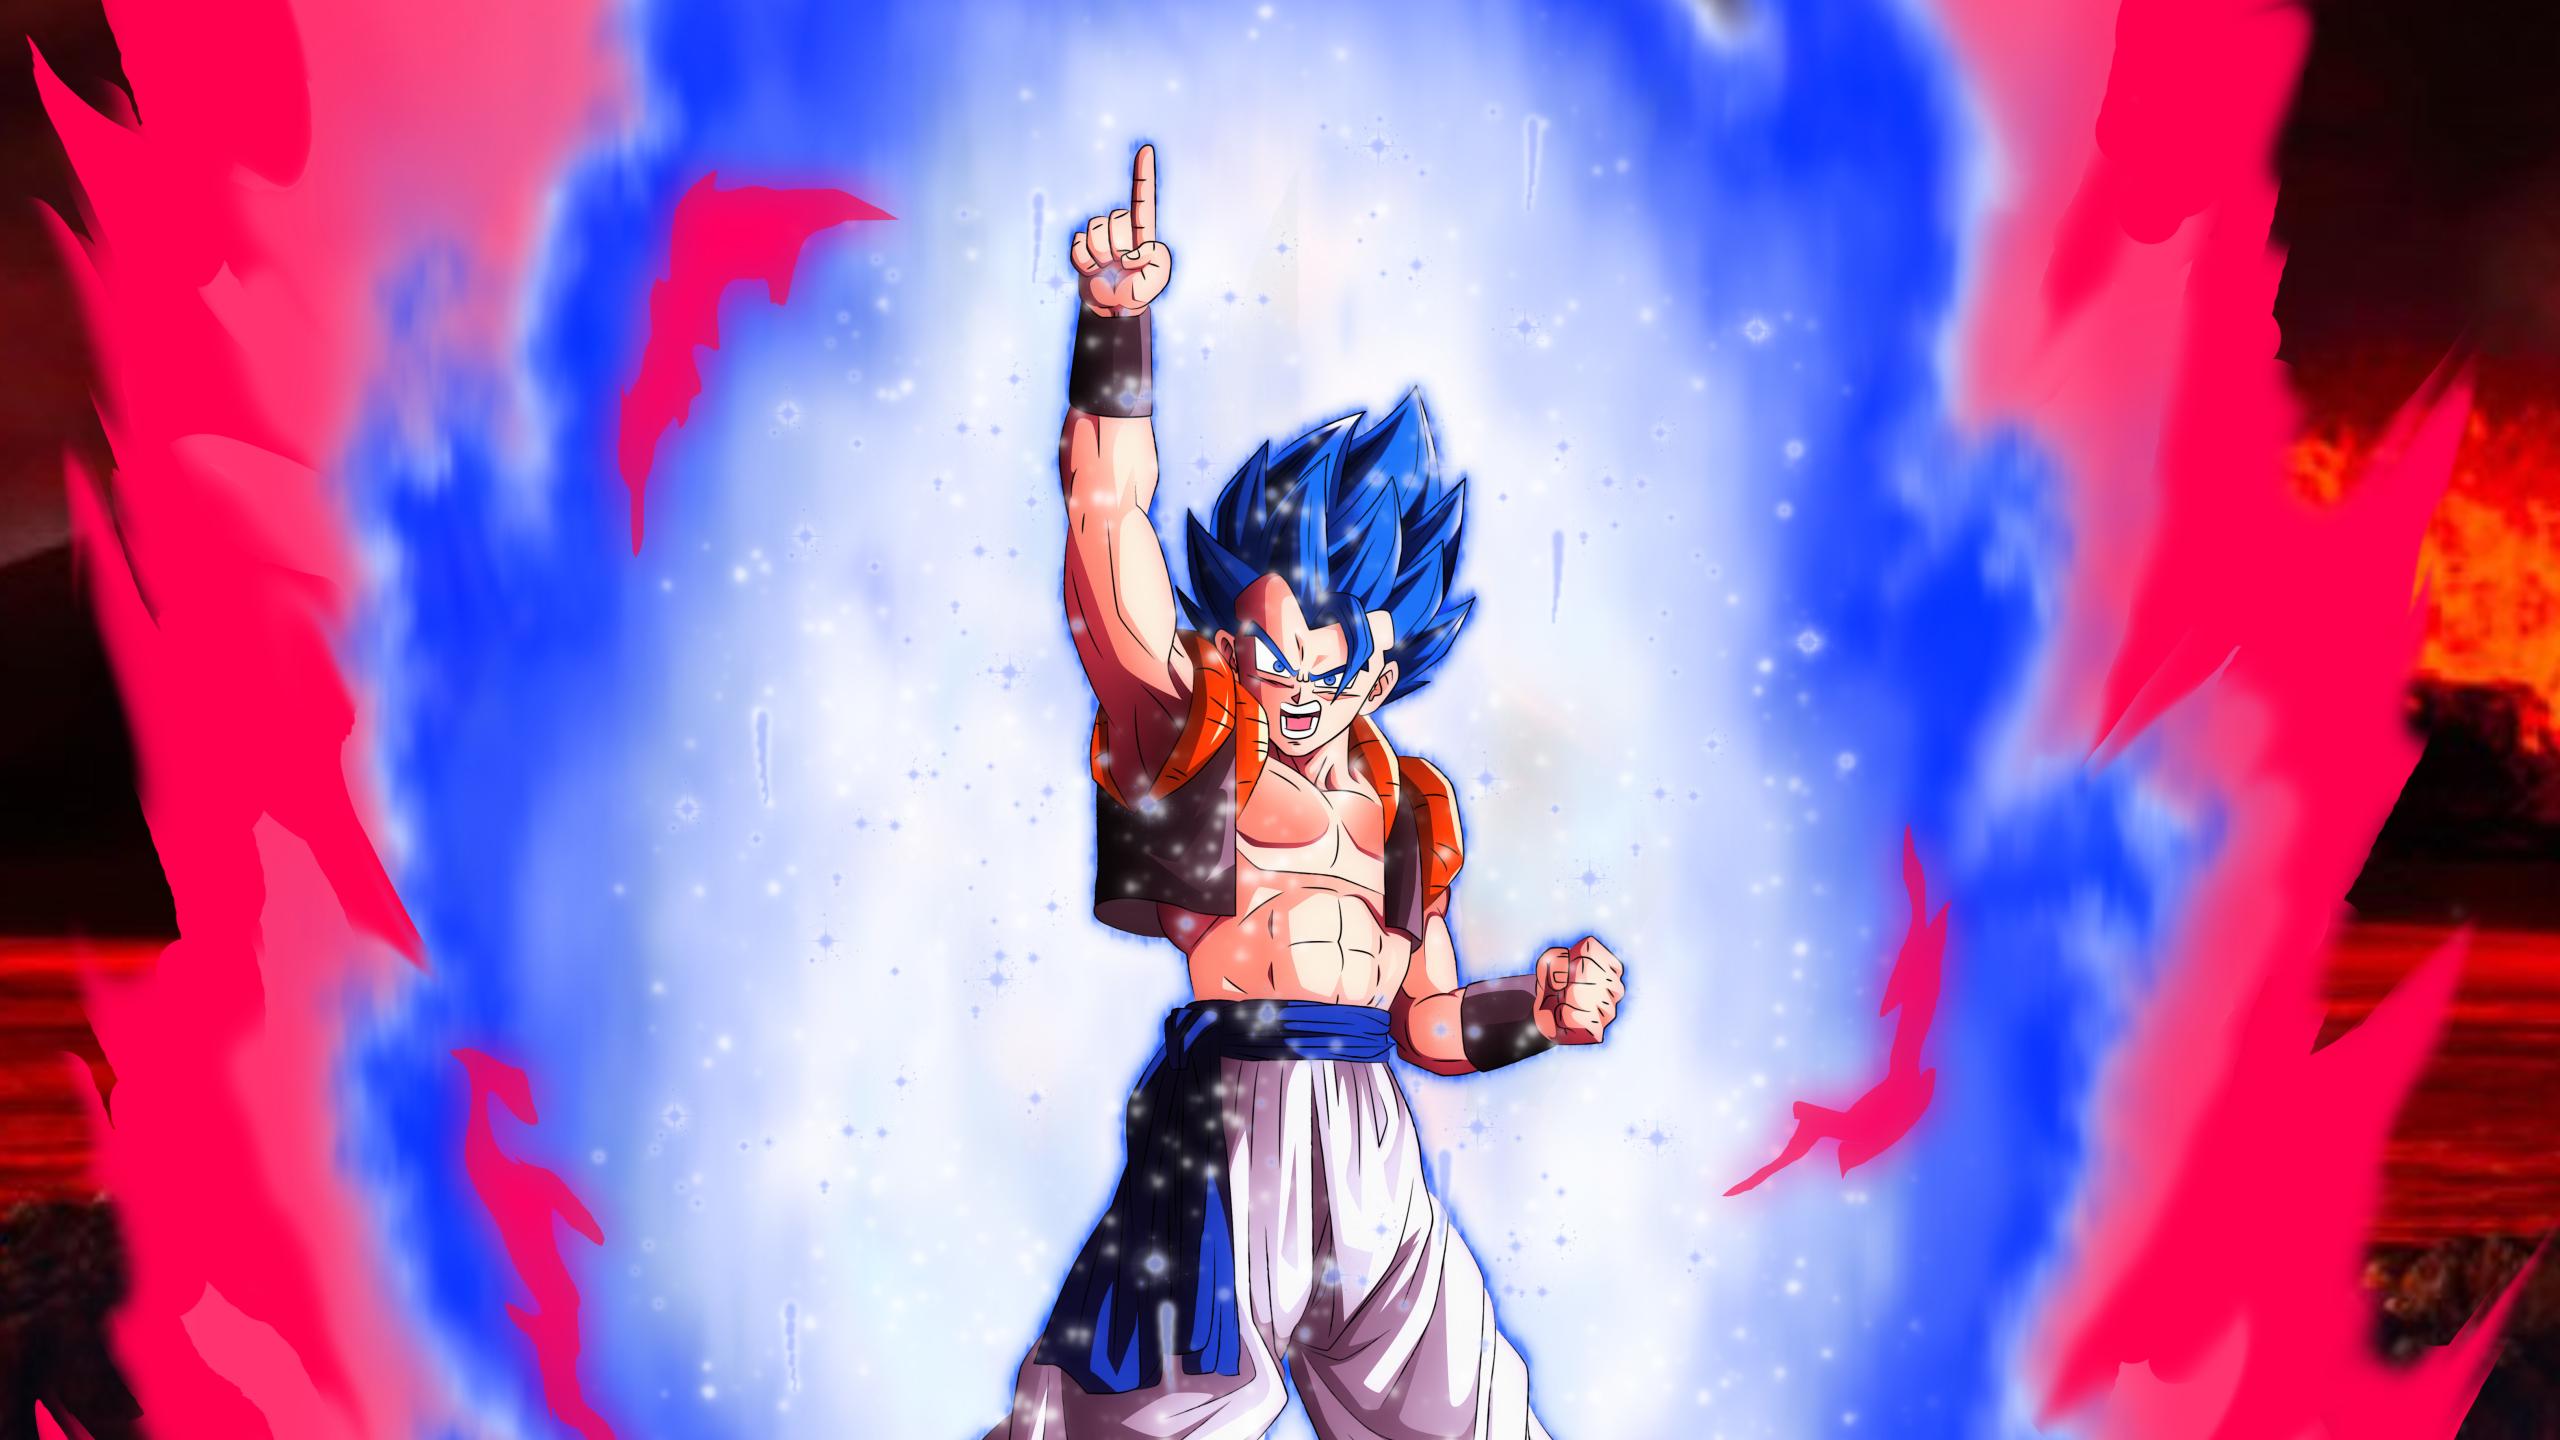 2560x1440 Gogeta Ssbx10 1440p Resolution Wallpaper Hd Anime 4k